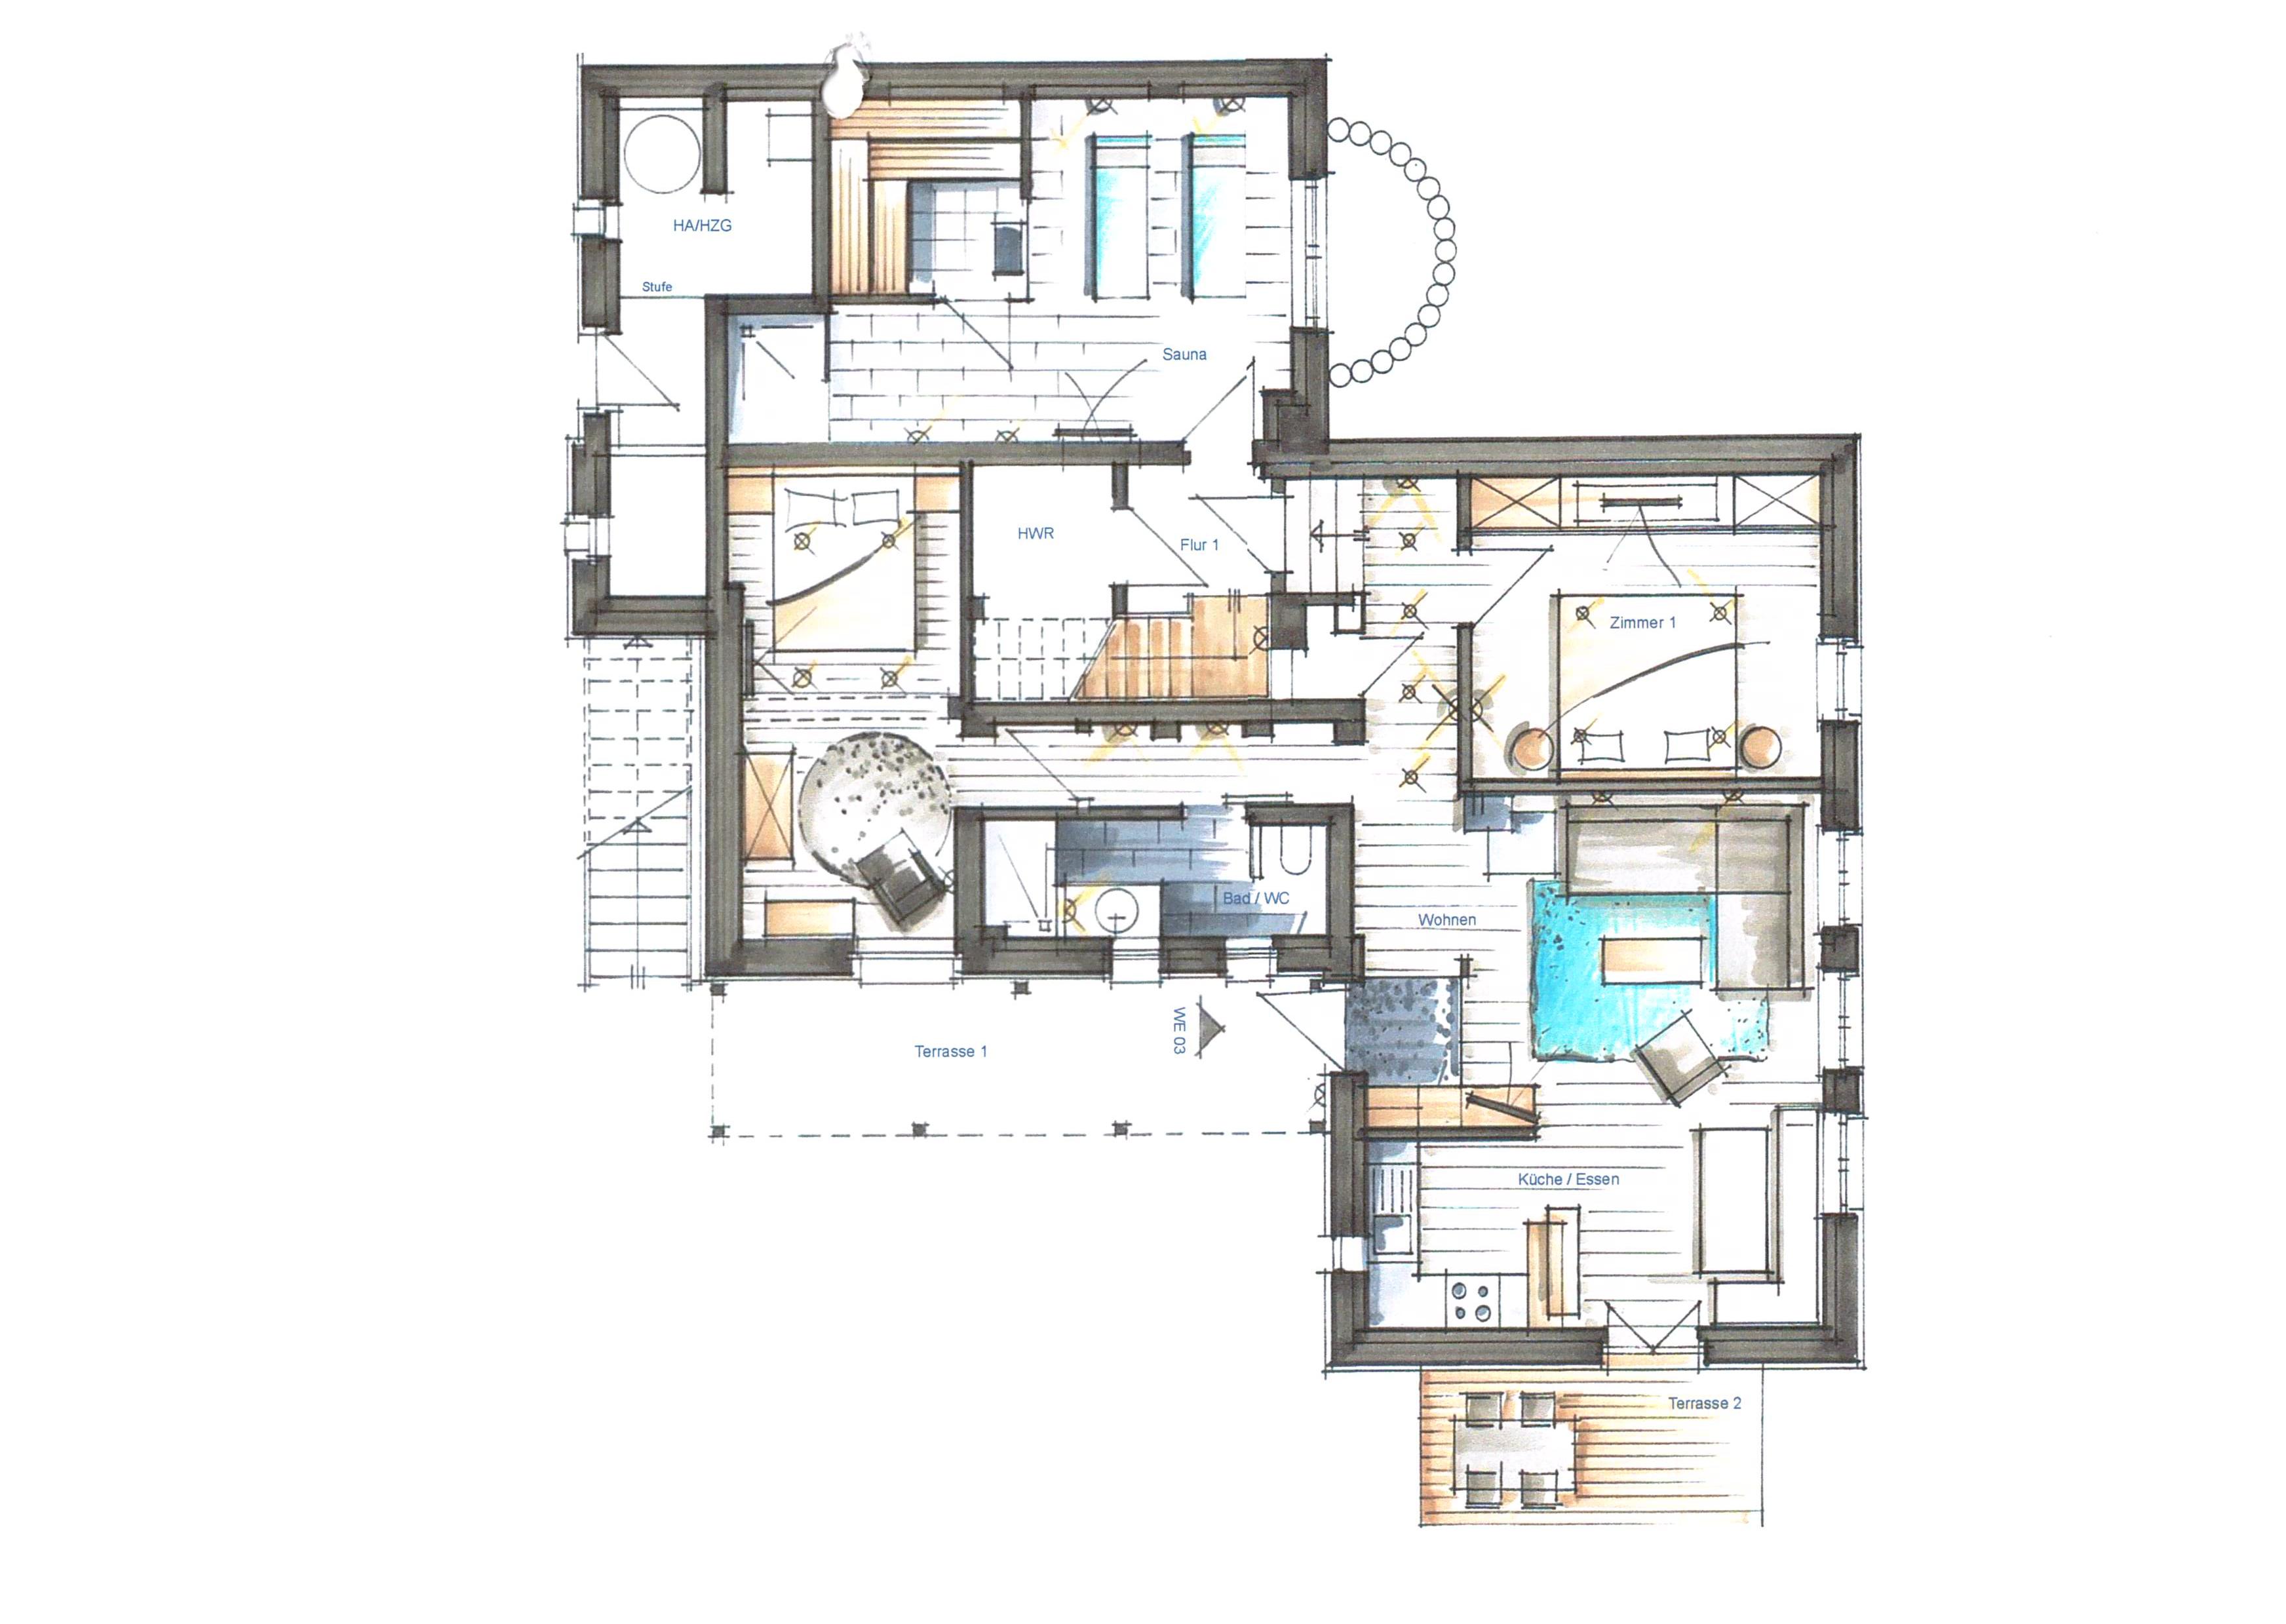 kapit nshaus app 03 ferienwohnung in heringsdorf seebad usedomtravel. Black Bedroom Furniture Sets. Home Design Ideas